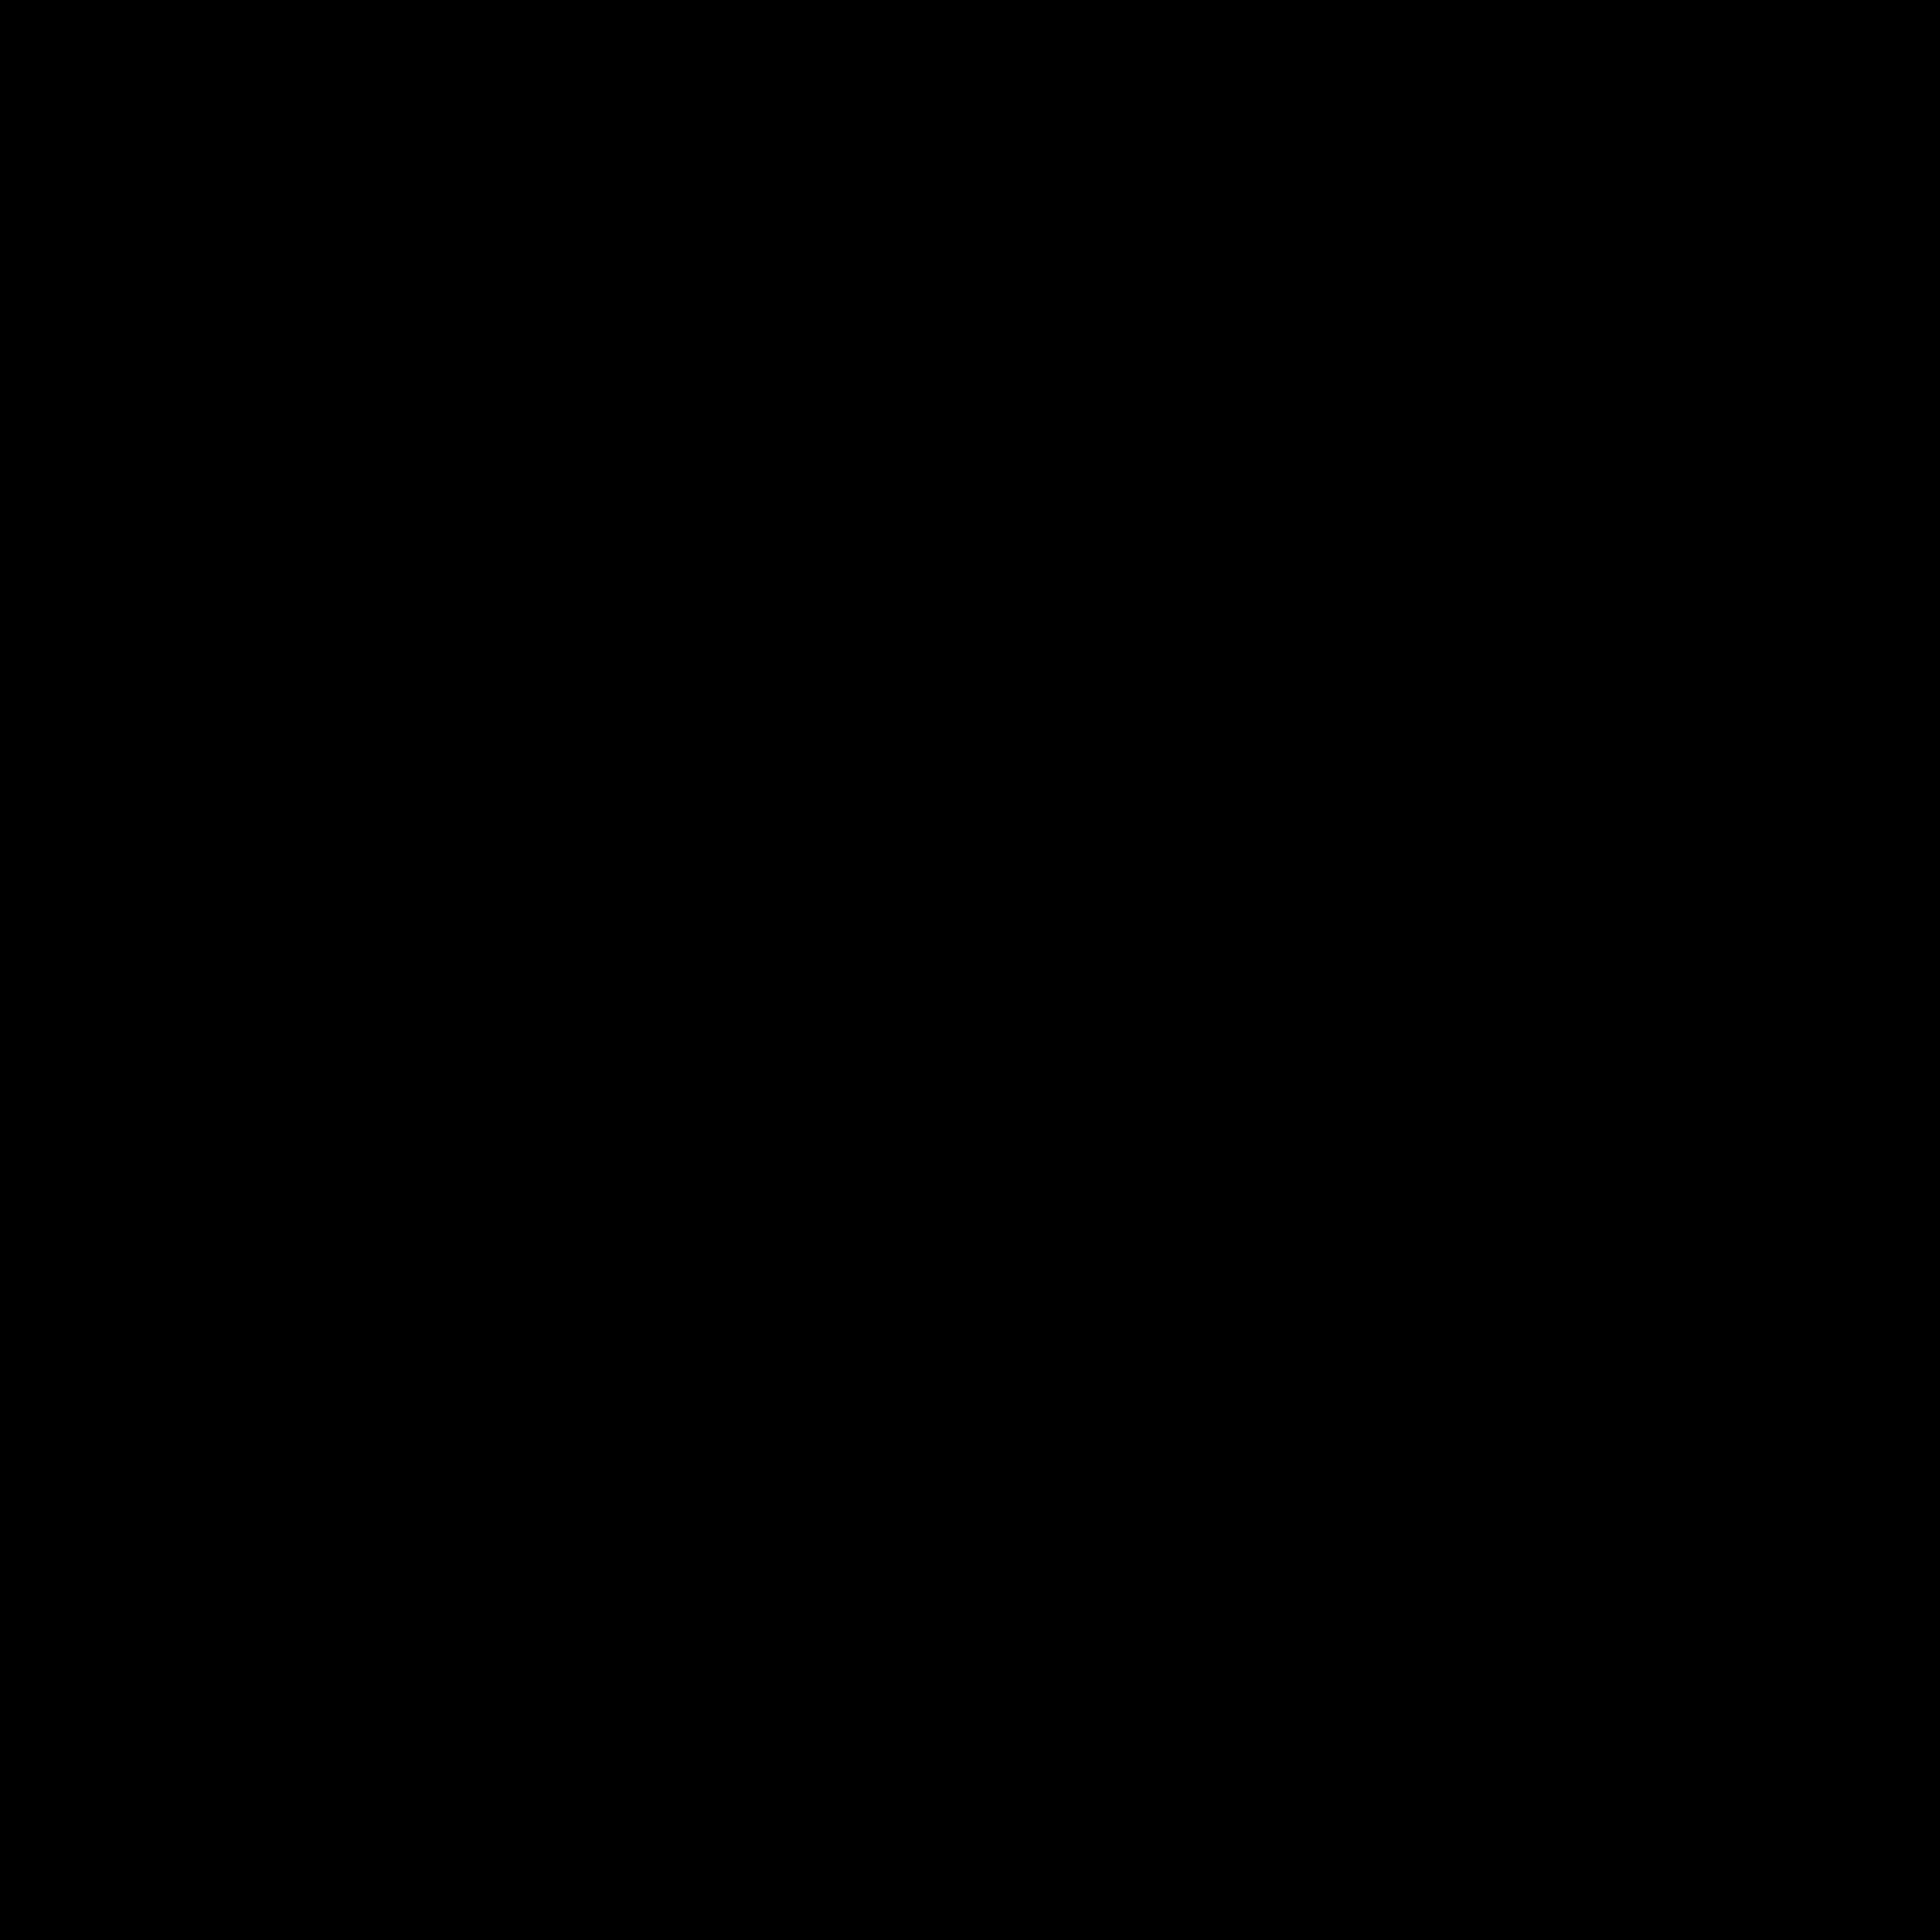 microsoft logo png transparent svg vector freebie supply rh freebiesupply com microsoft excel logo vector microsoft logo vector version